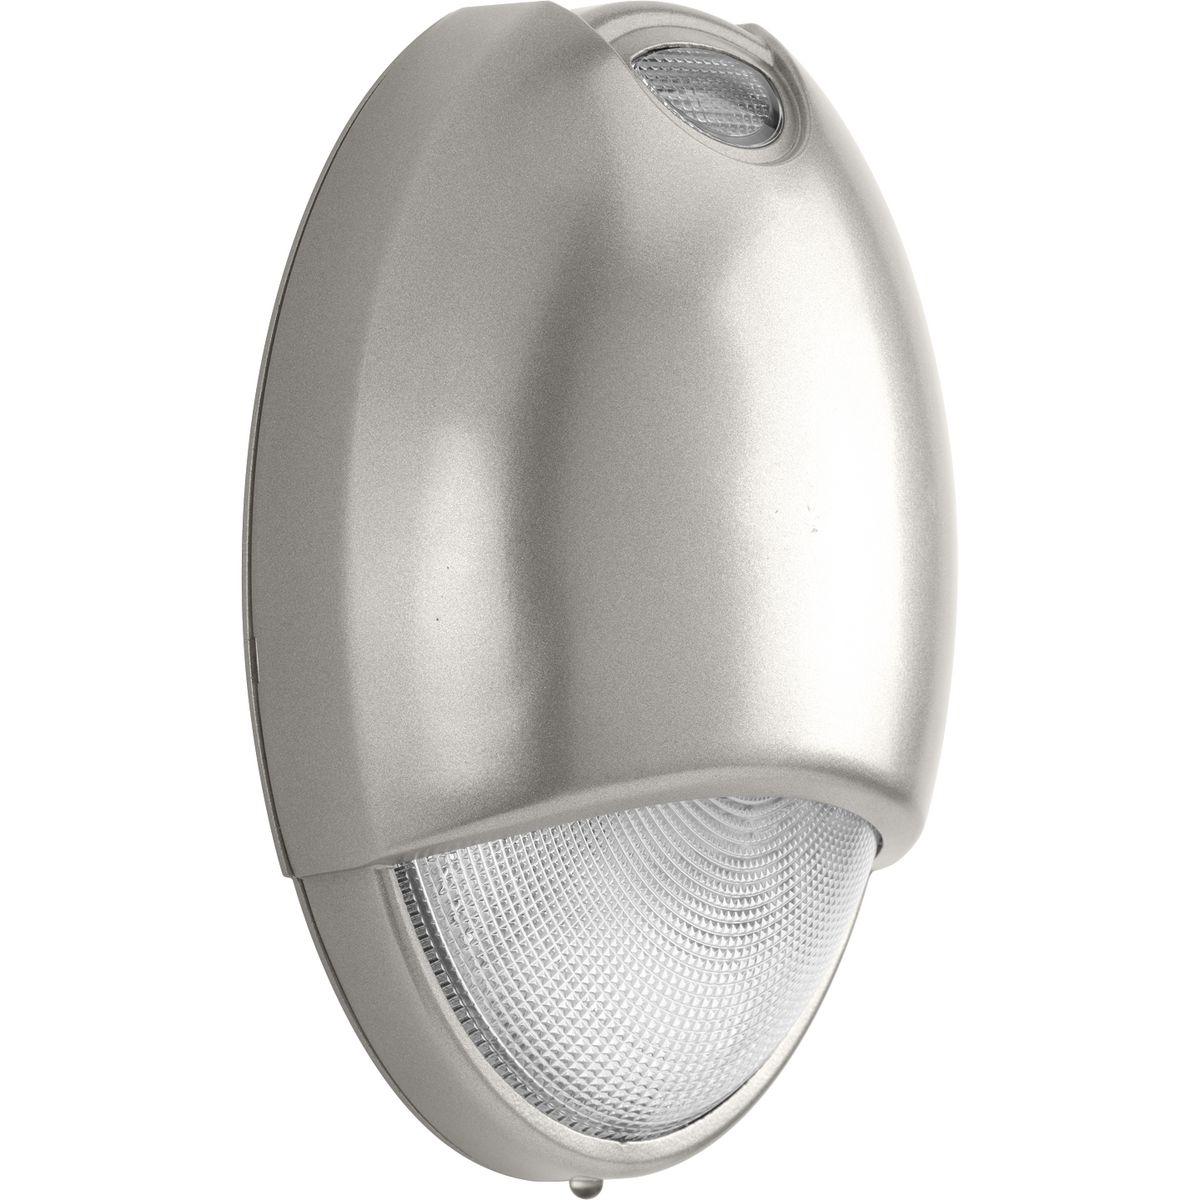 LED AC EMERGENCY LIGHT Gray